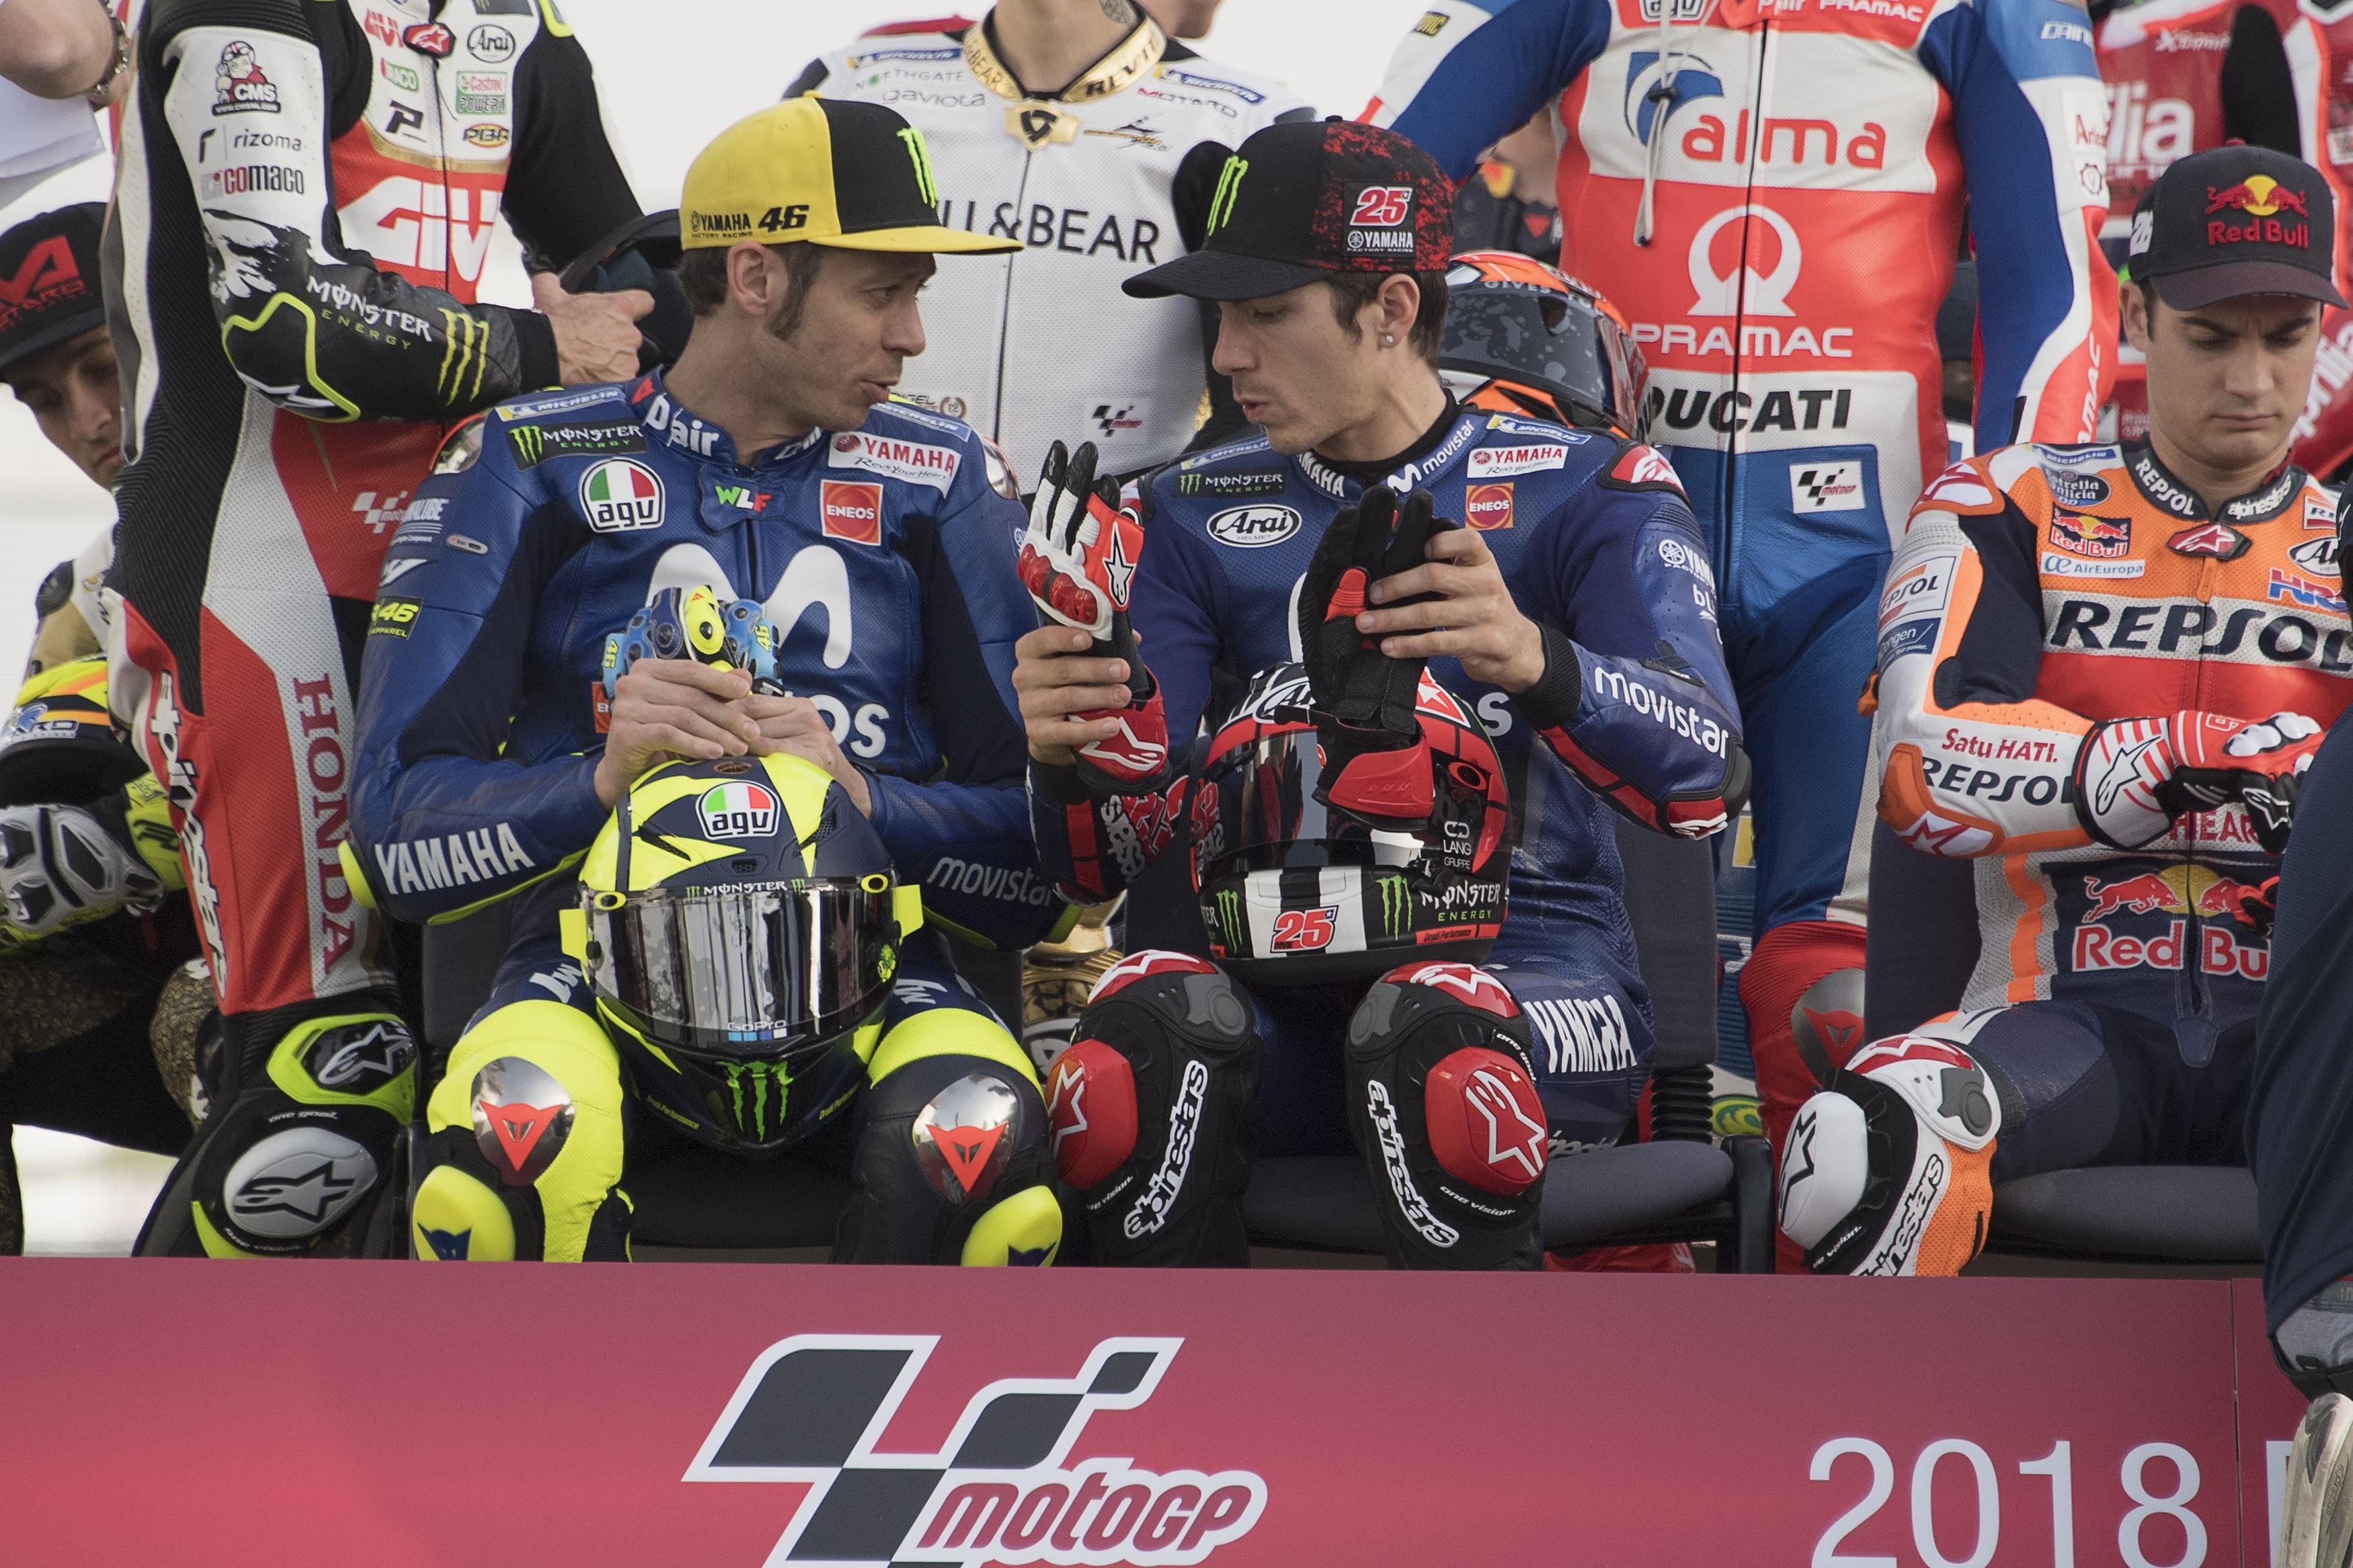 Valentino Rossi, Maverick Vinales (Yamaha Factory) au Grand Prix du Qatar 2018